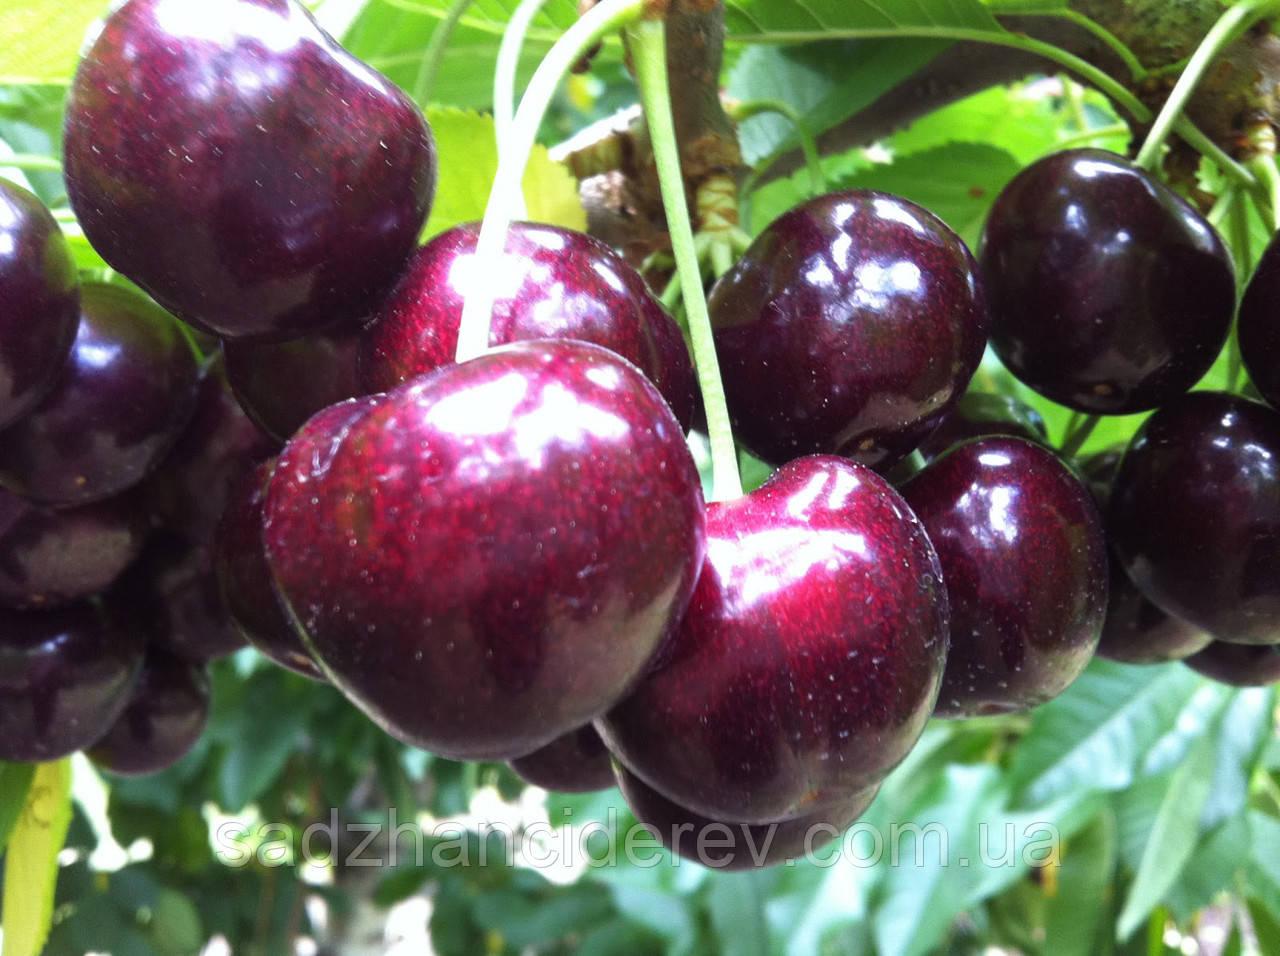 Саджанці черешні Стакато (Staccato)